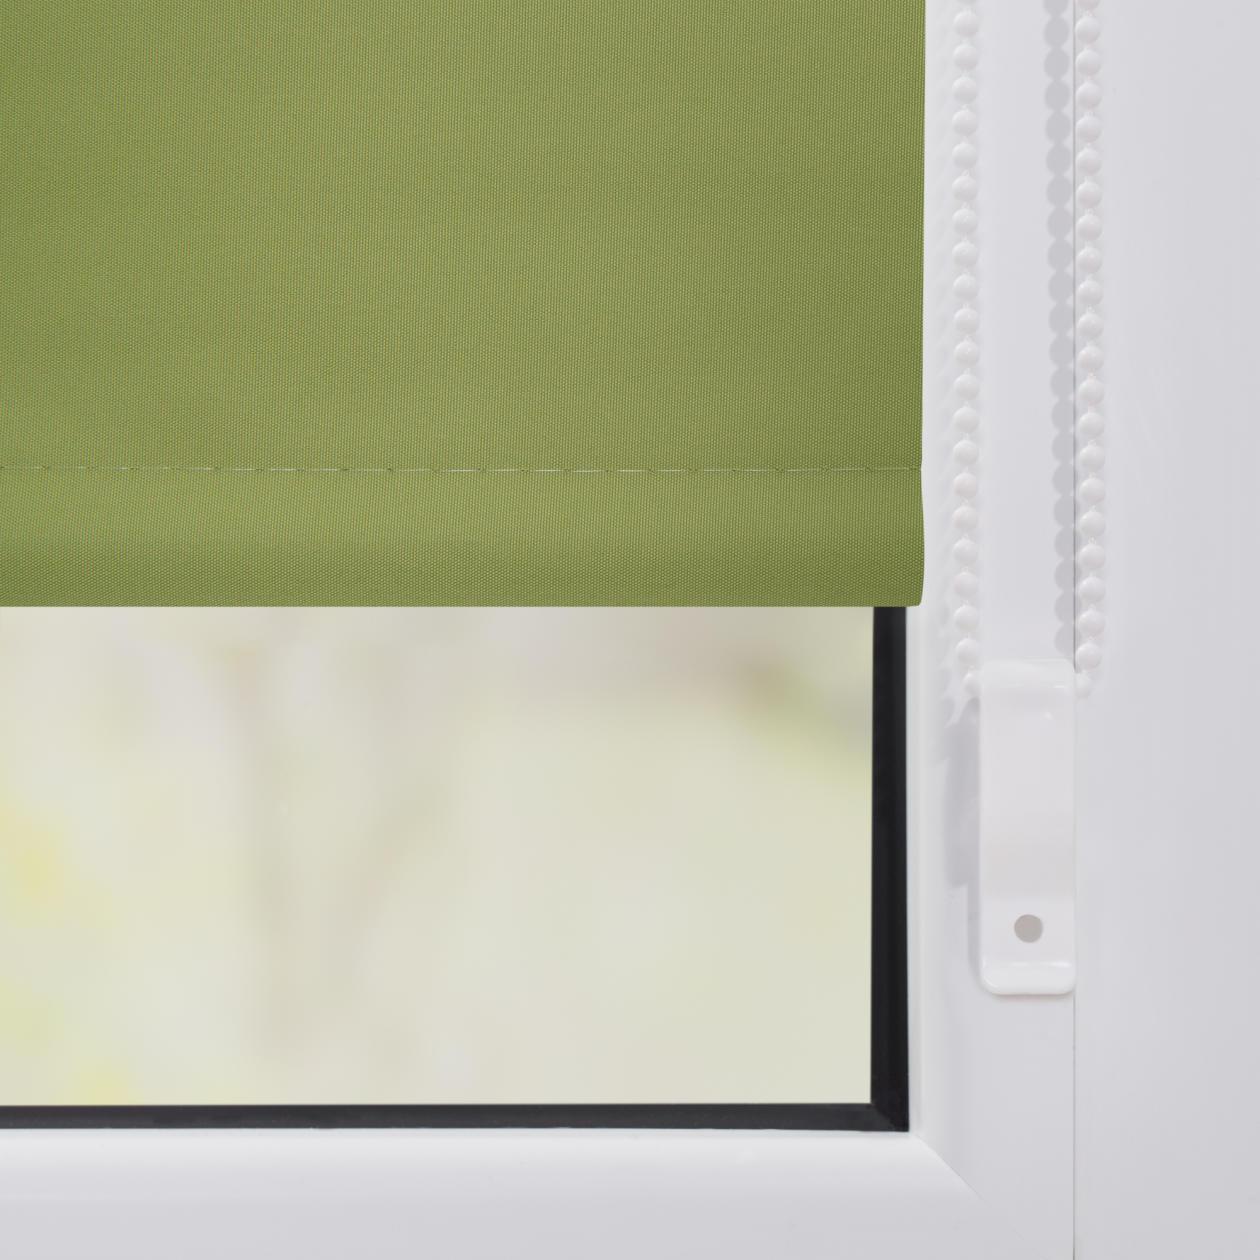 thermo rollo klemmfix ohne bohren verdunkelung lichblick shop. Black Bedroom Furniture Sets. Home Design Ideas